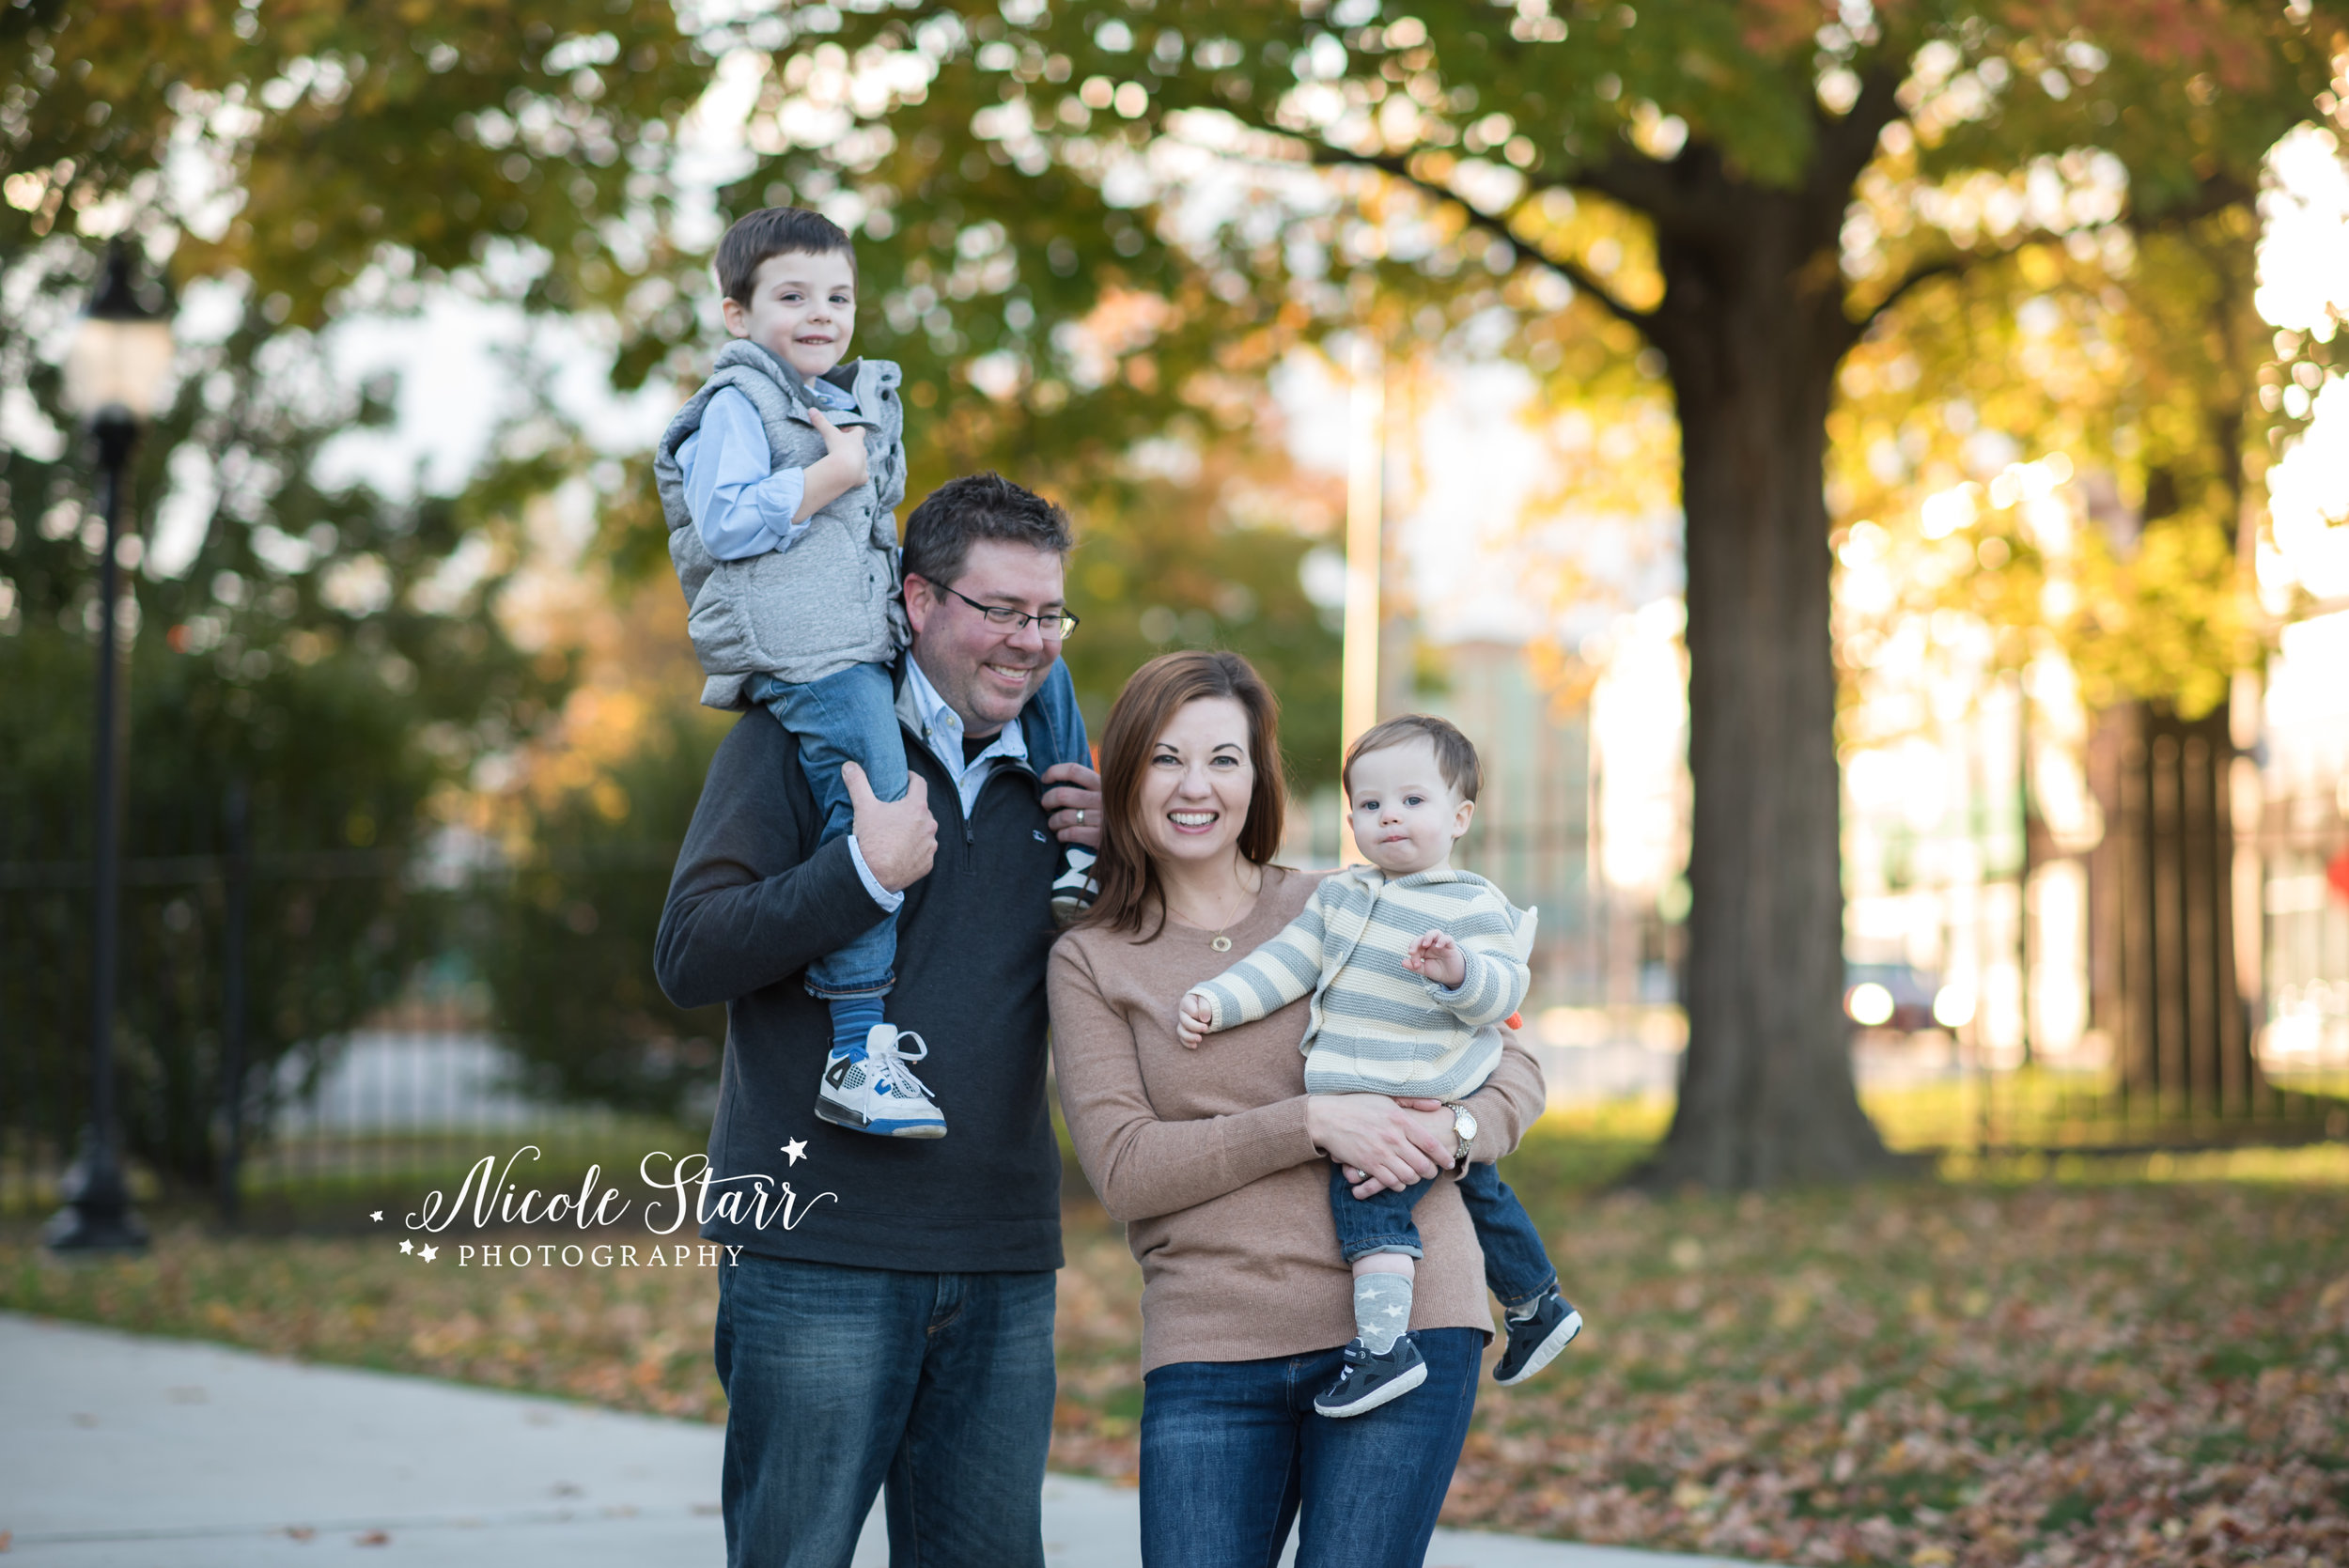 Nicole Starr Photography   Saratoga Springs Family Photographer   Boston Family Photographer   Upstate NY Family Photographer   Family Photographer   Delmar NY family photographer   Loudonville NY family photographer